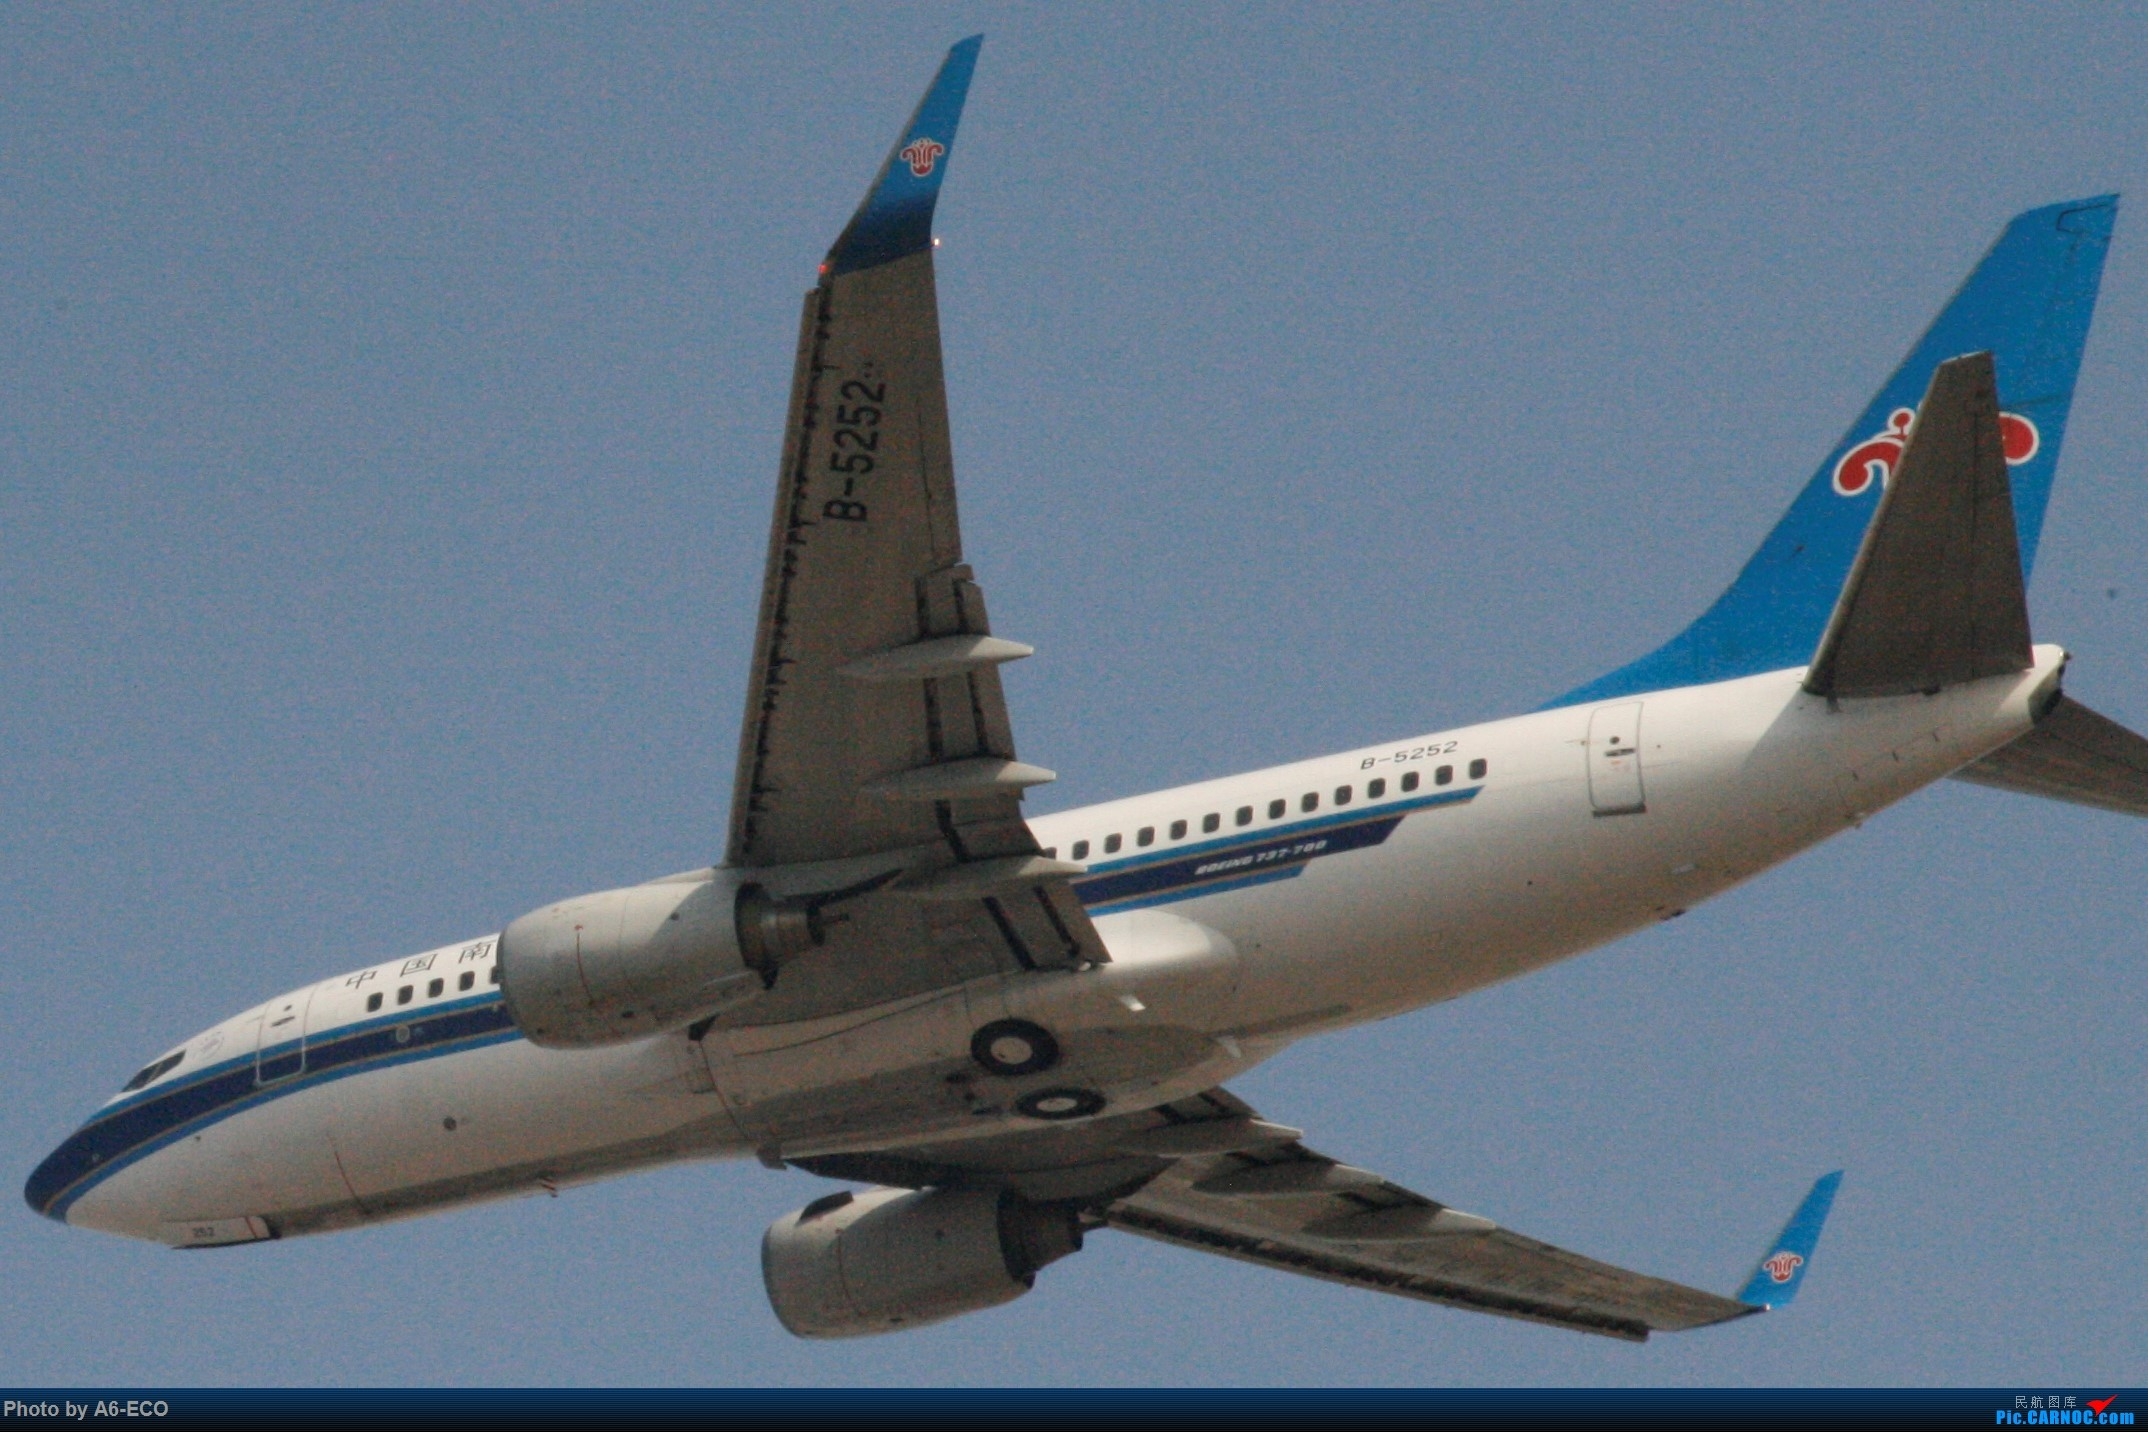 Re:[原创]今天运气极好,云南孔雀,B-1070,2个菜航邮戳,泡菜航彩绘,东航邮戳...... BOEING 737-700 B-5252 中国北京首都国际机场